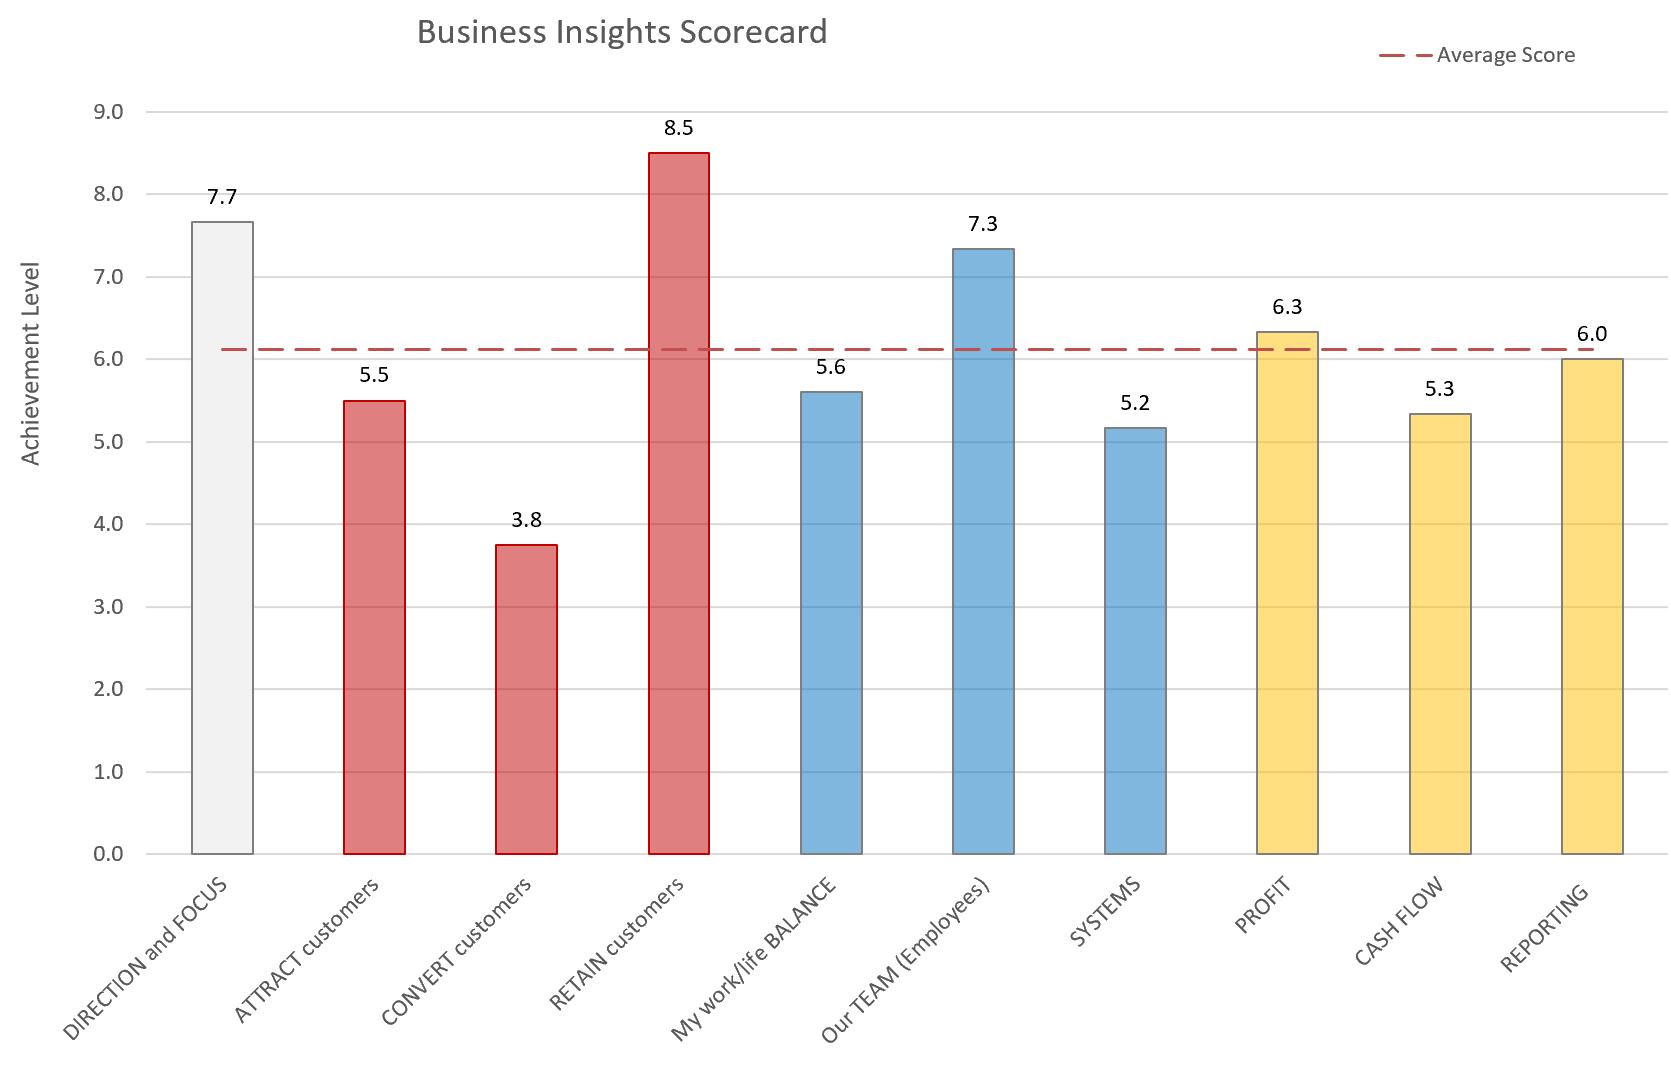 Business Insights Scorecard - Bar